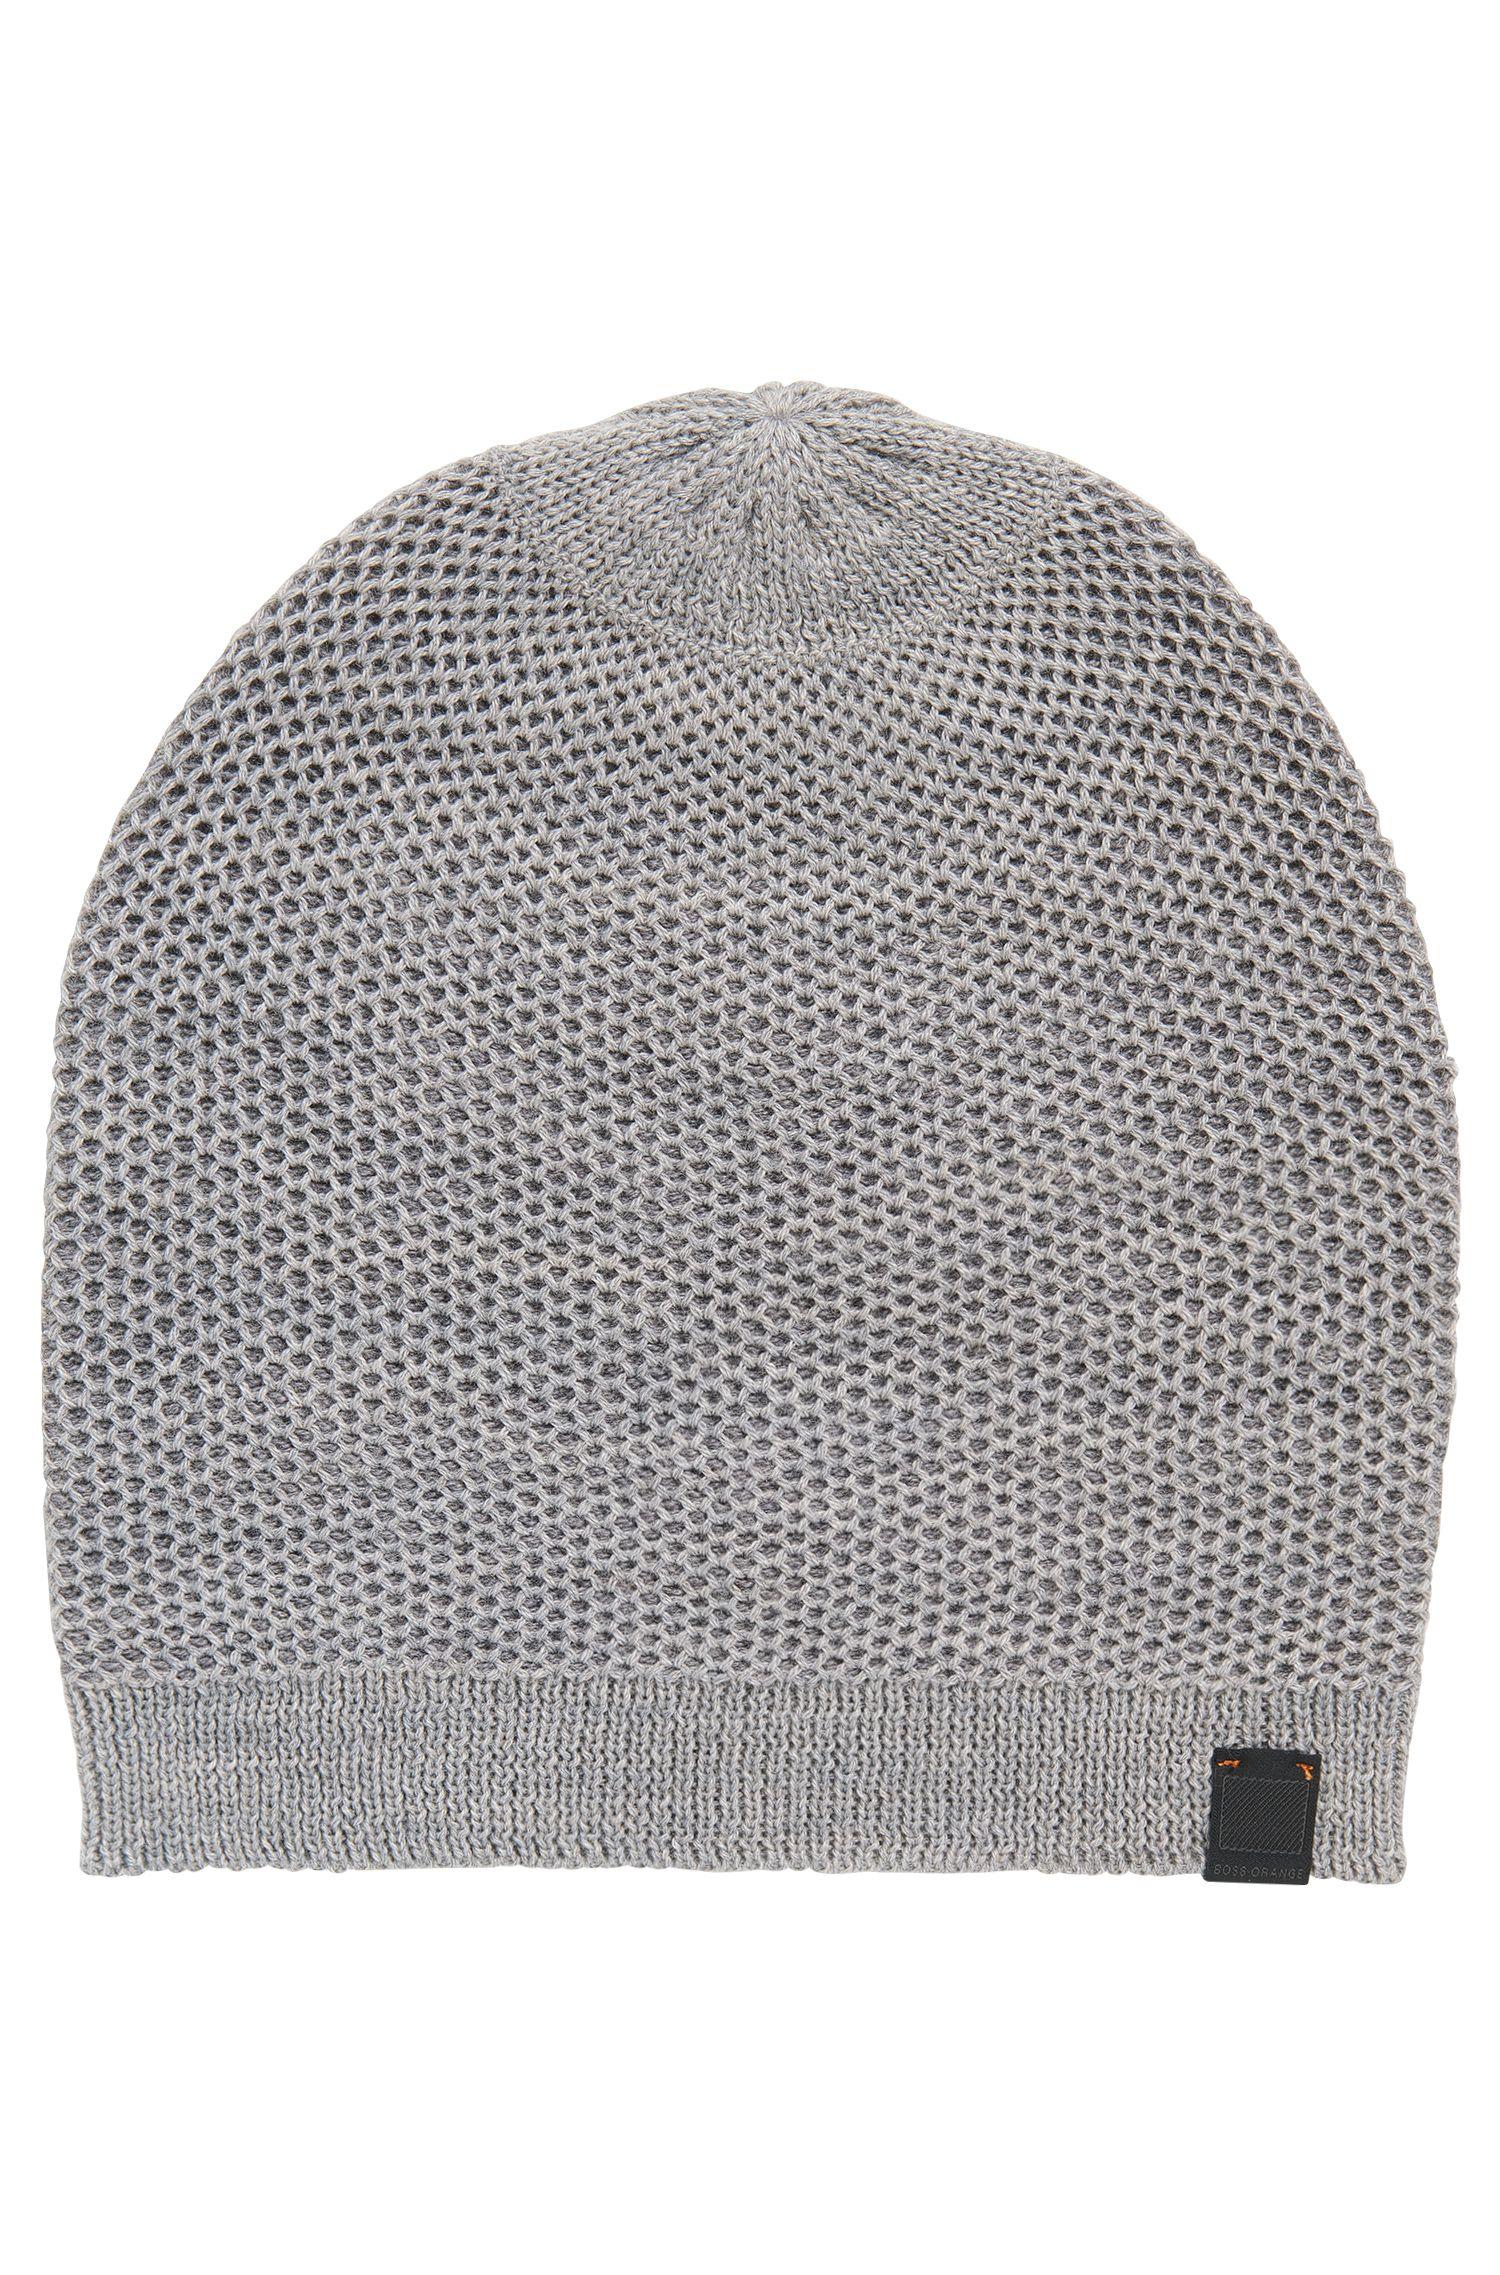 Wool Blend Knit Beanie | Franek